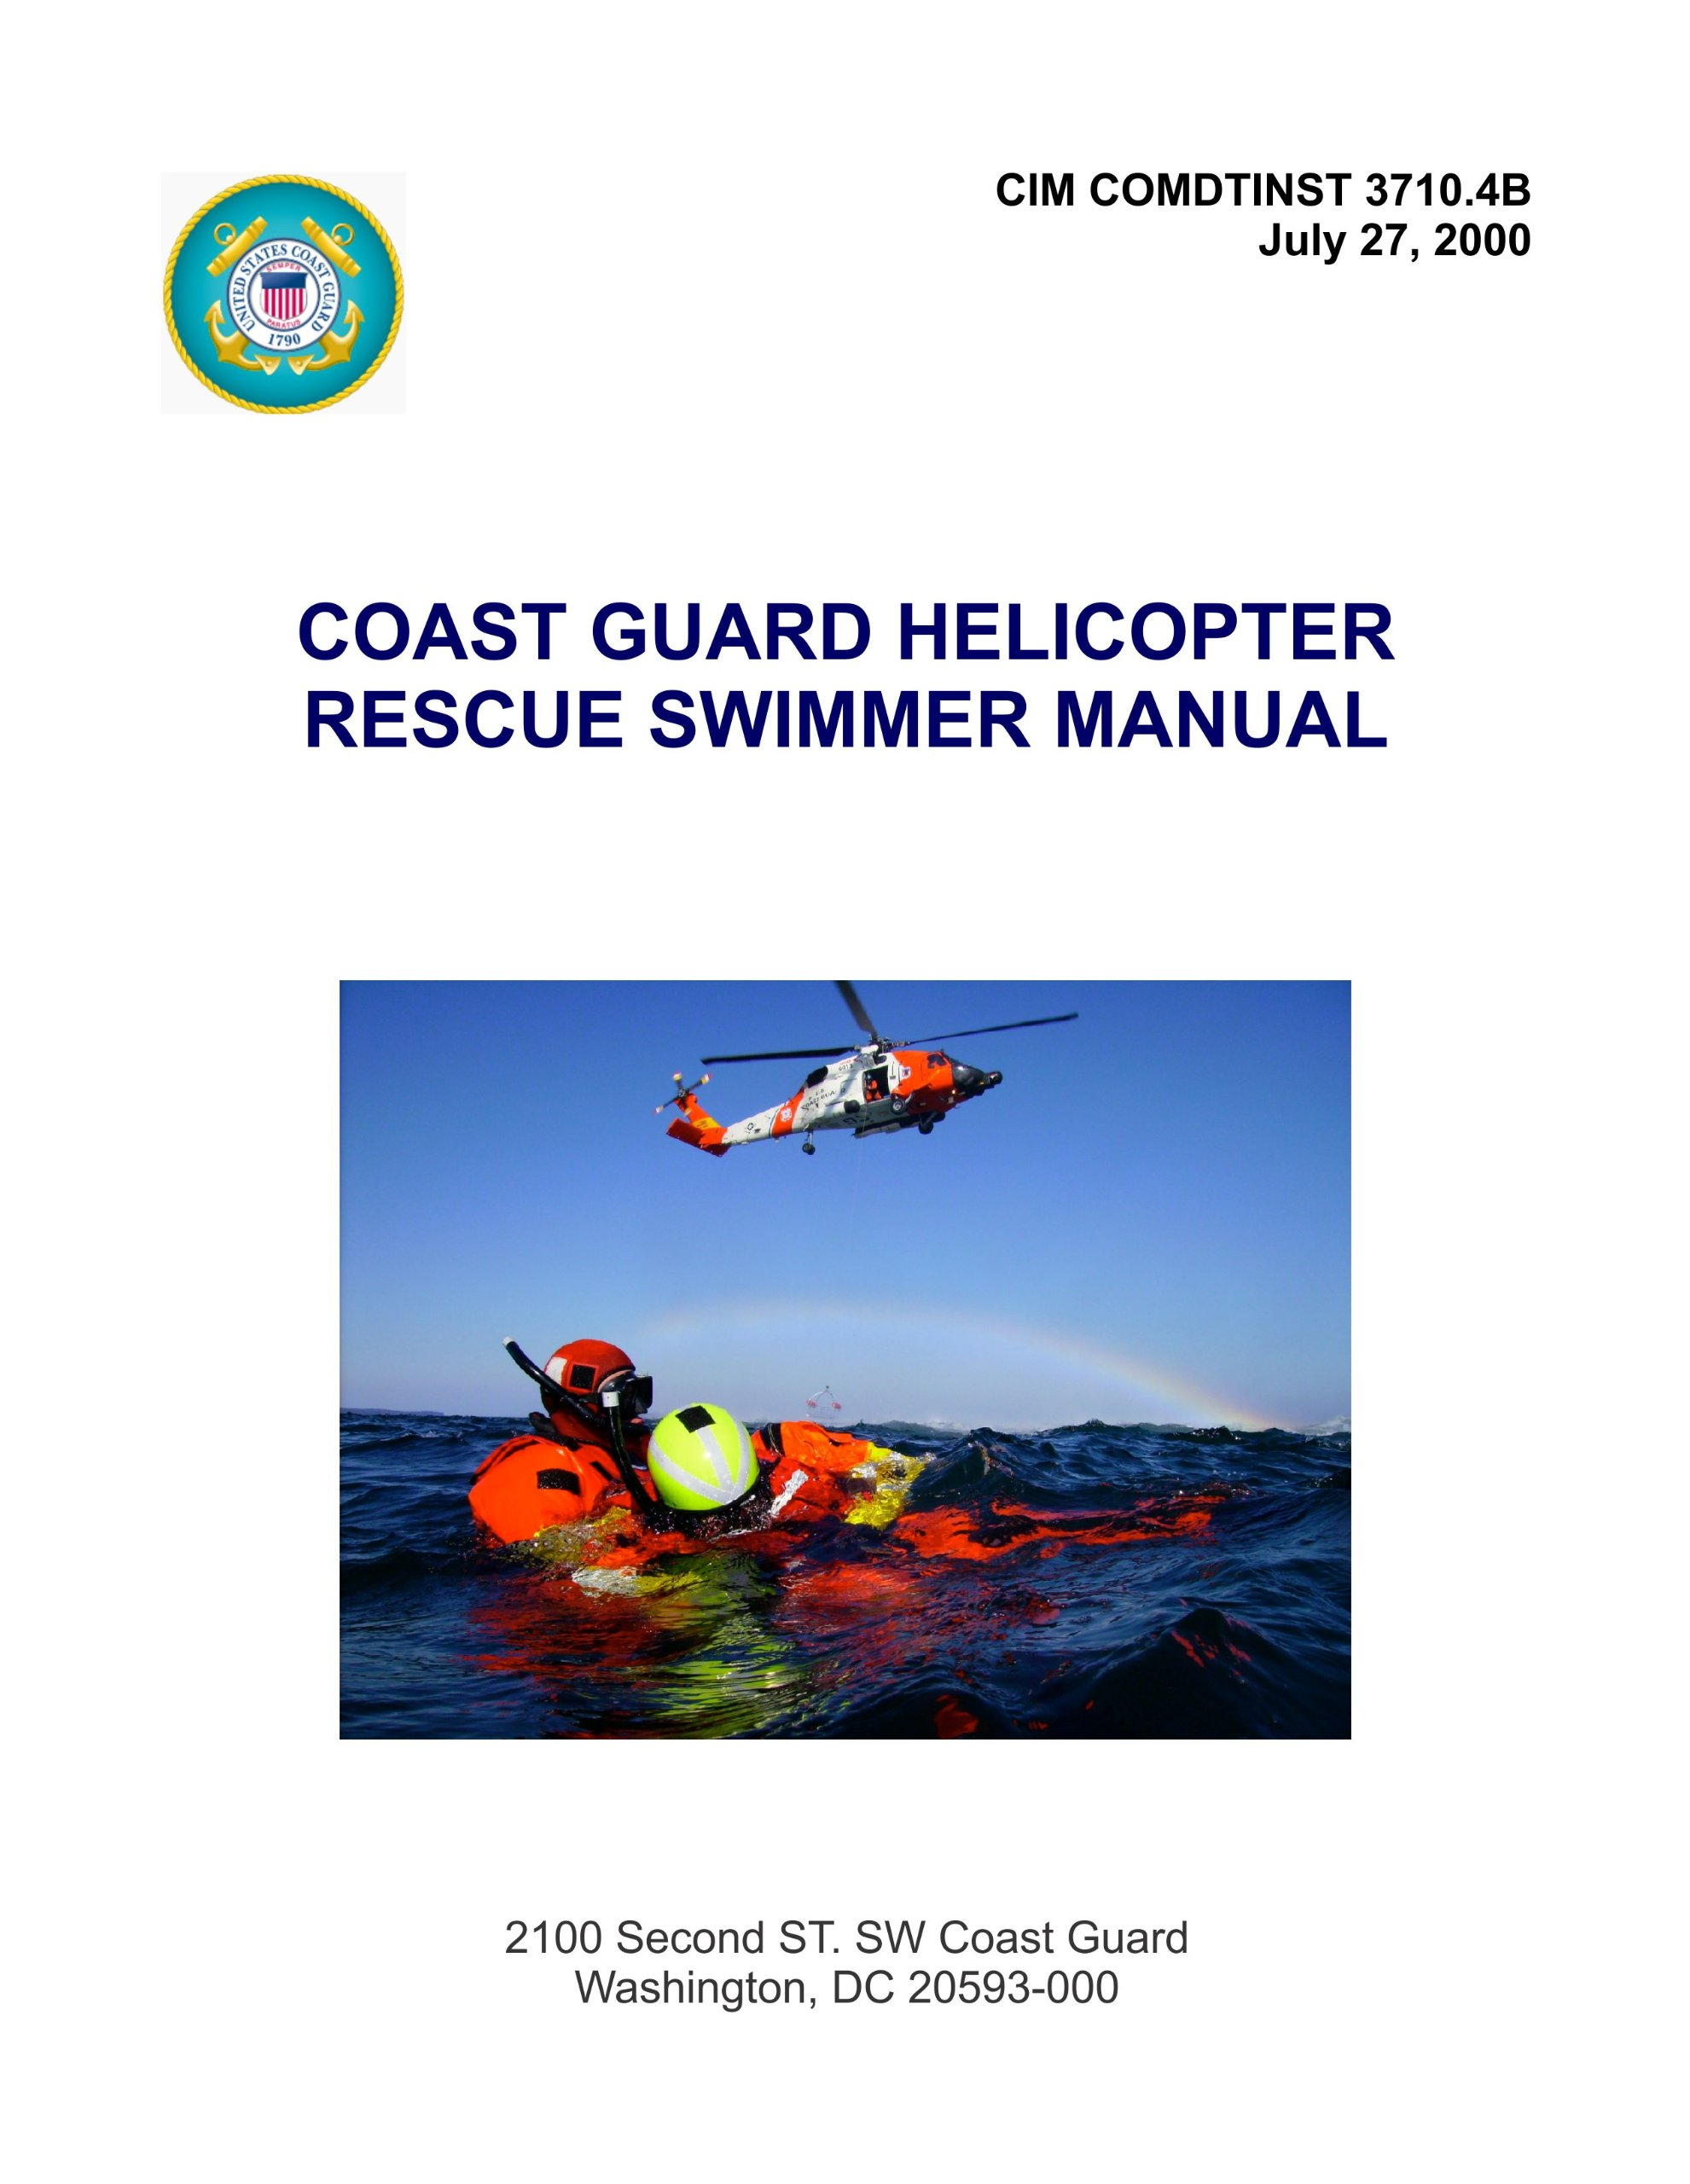 cim comdtinst 3710 4b coast guard helicopter rescue swimmer manual rh amazon com coast guard manual of arms coast guard manuals and publications